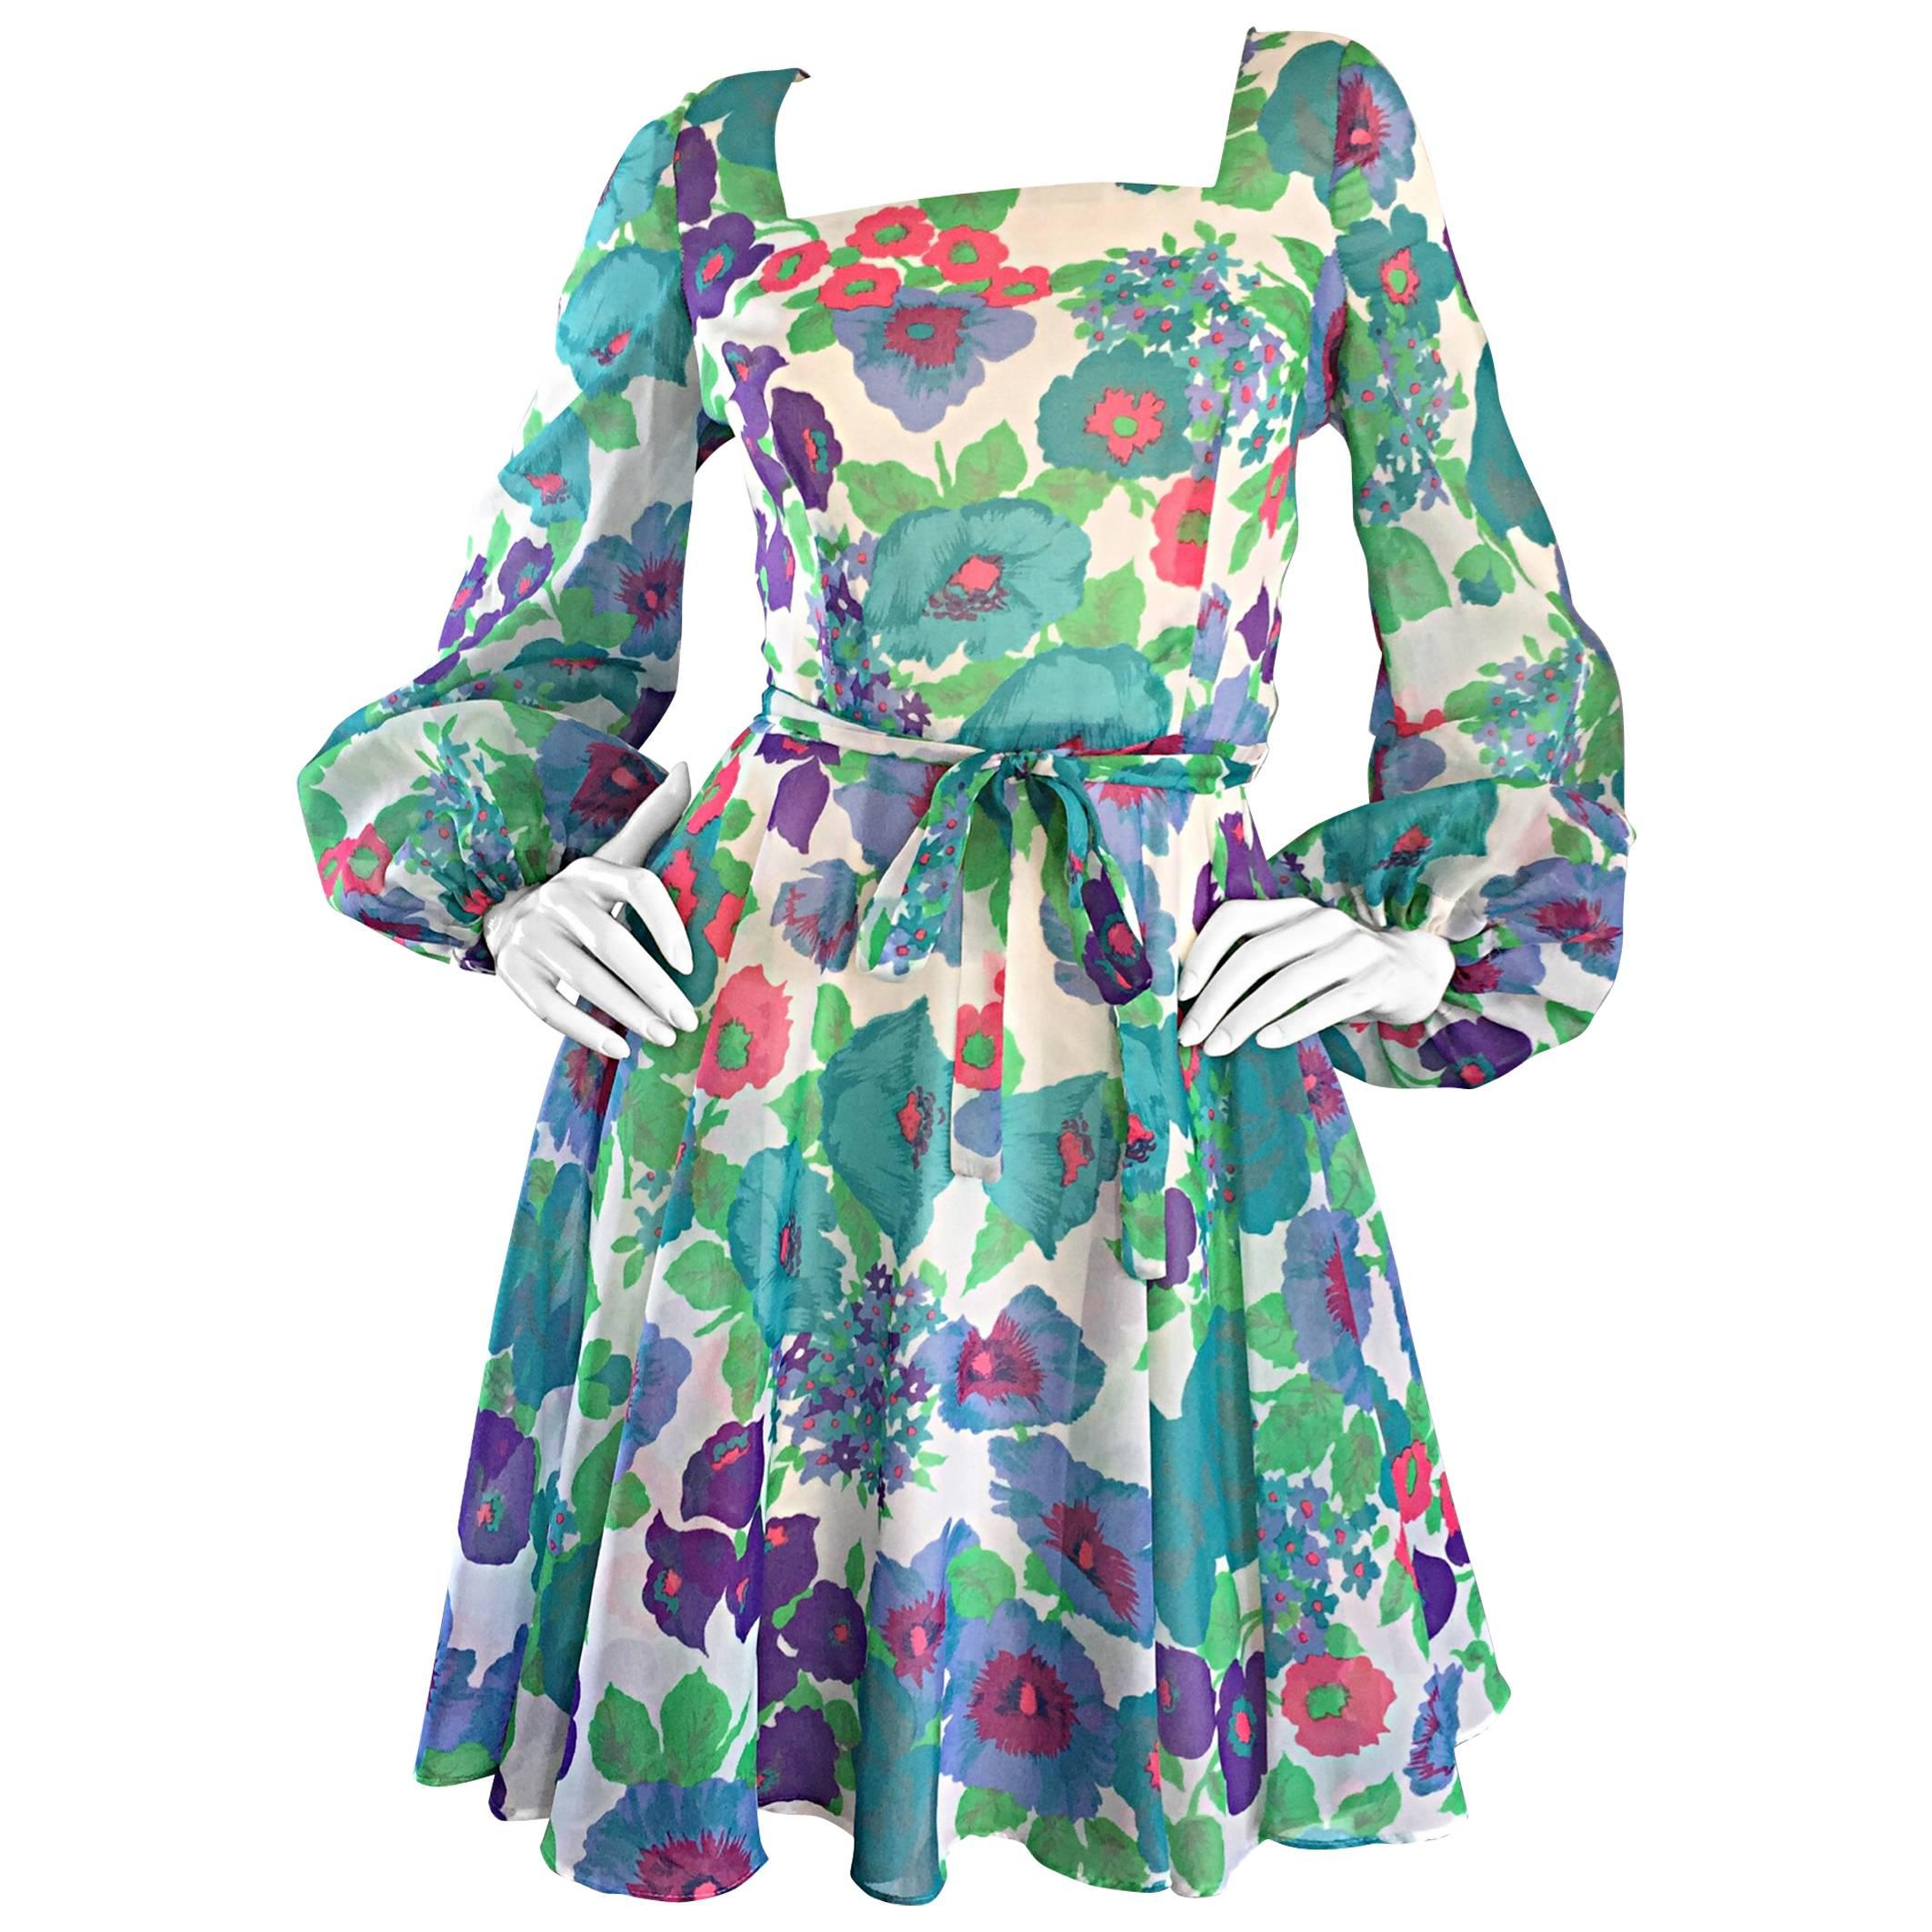 1960s Vintage Flower Printed Chiffon Blue, Purple, Green, Pink Babydoll Dress